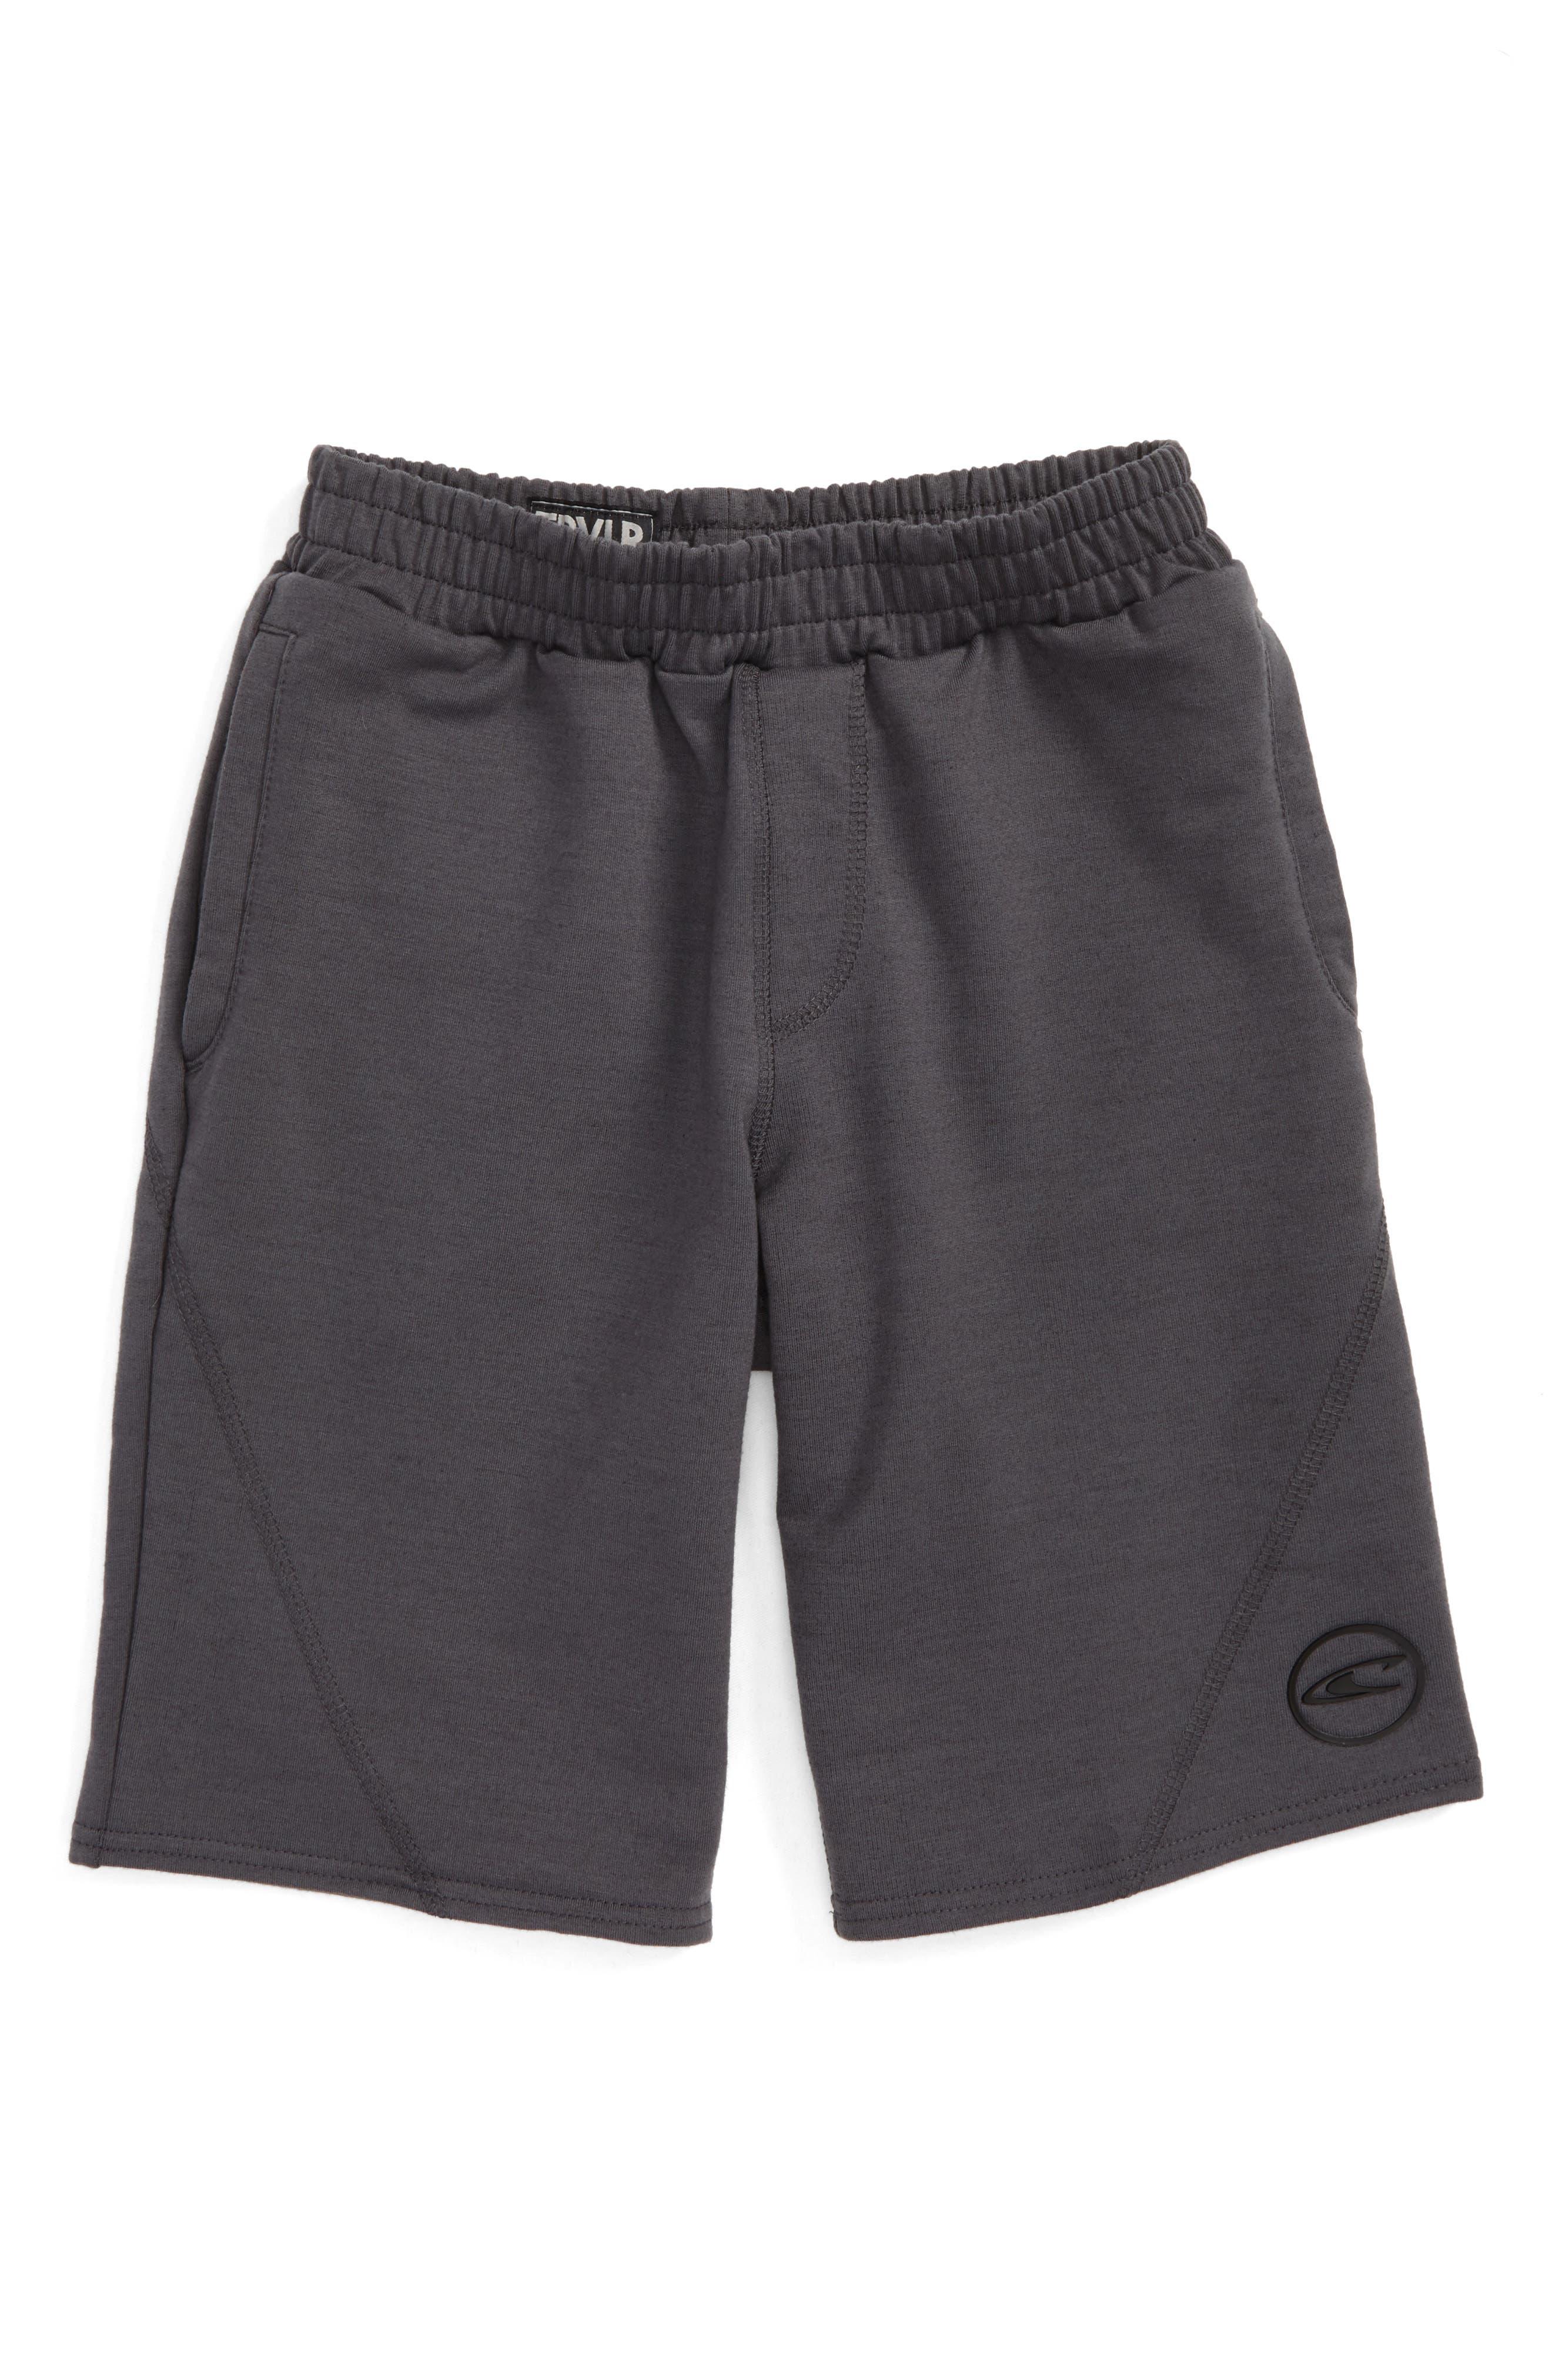 O'Neill Traveler Knit Shorts (Big Boys)